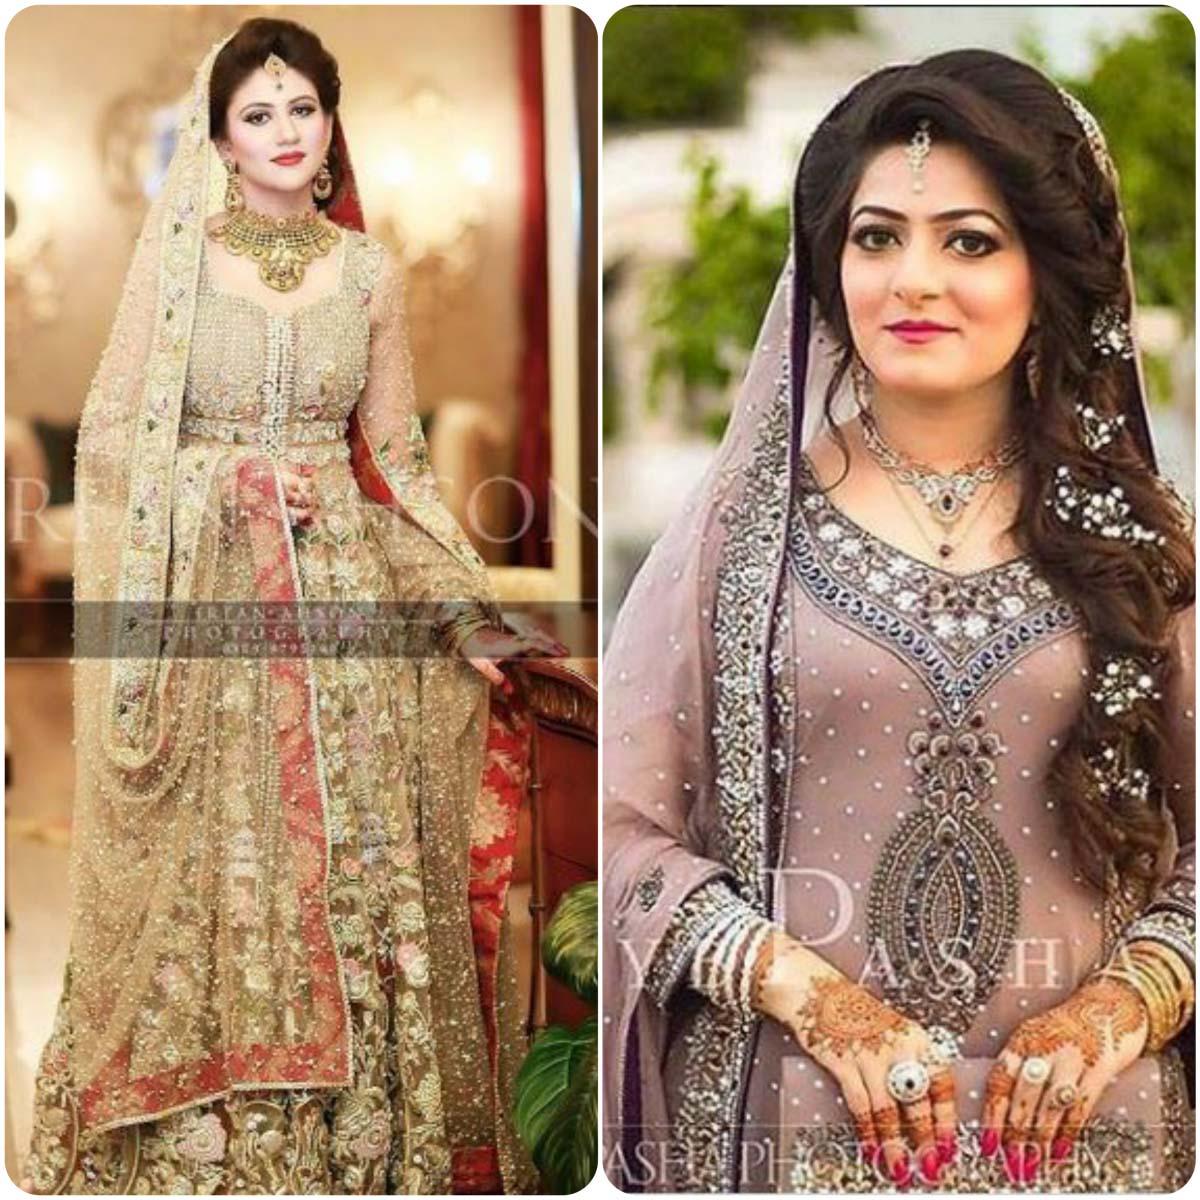 best-bridal-walima-dresses-2017-2018-designs-colors-9